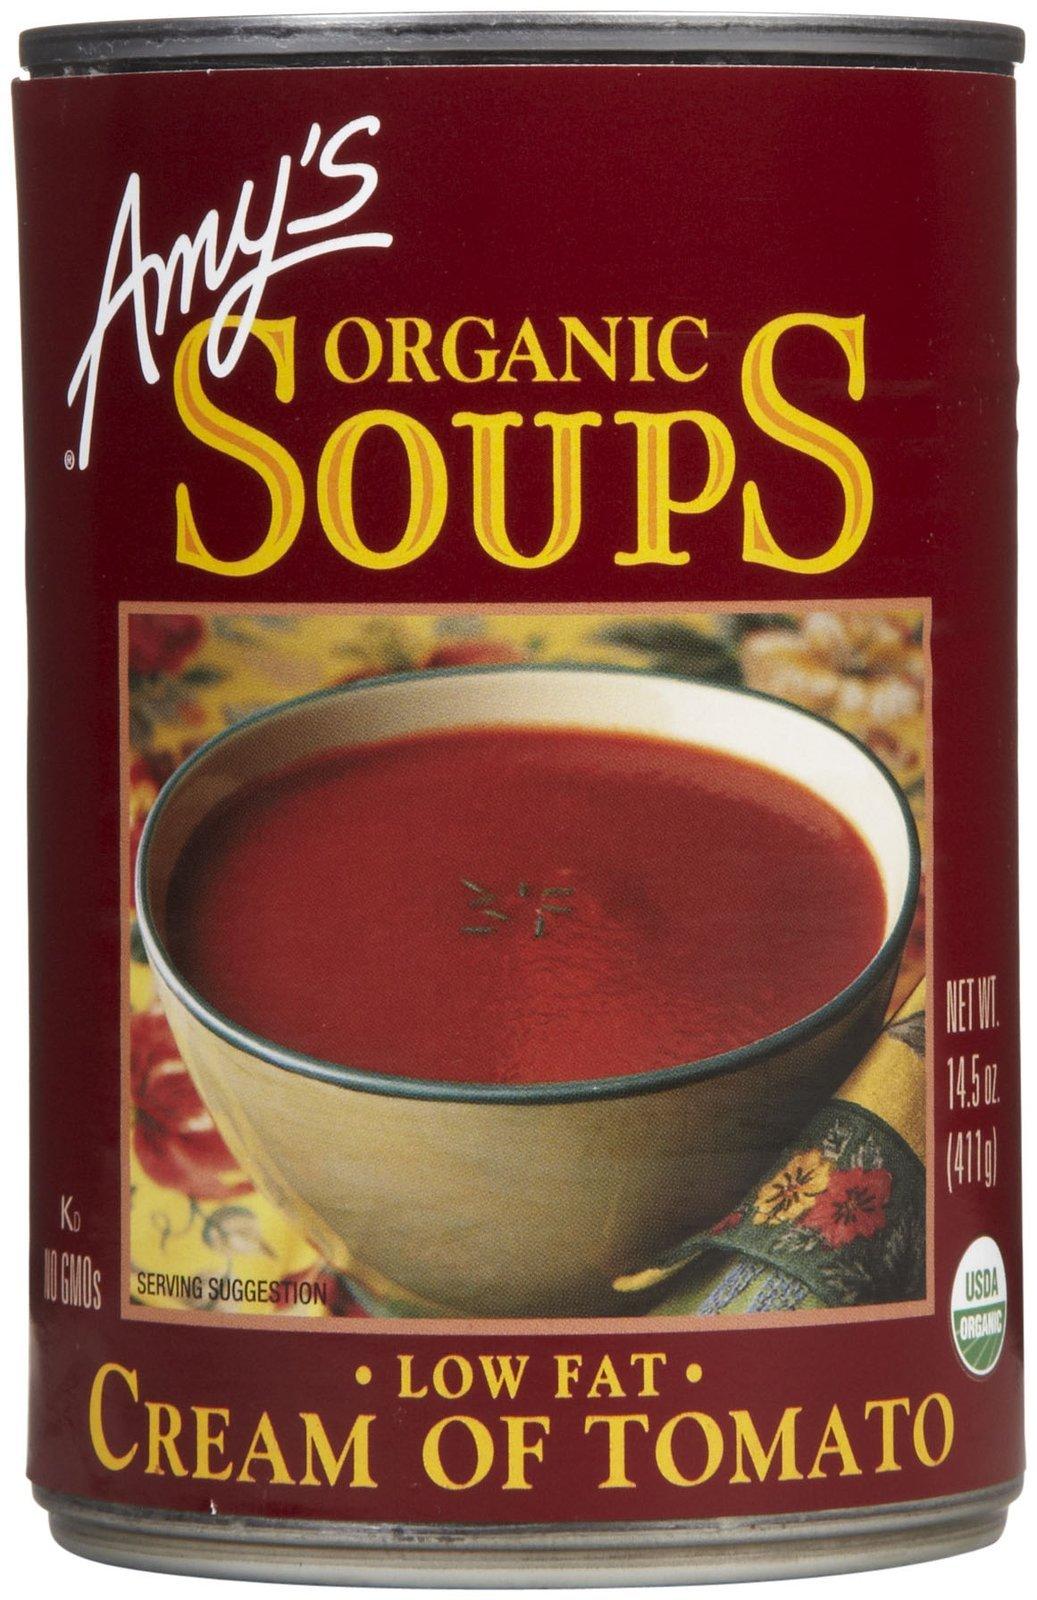 Amy's Organic Soups Cream of Tomato - 14.3 oz - 12 Count